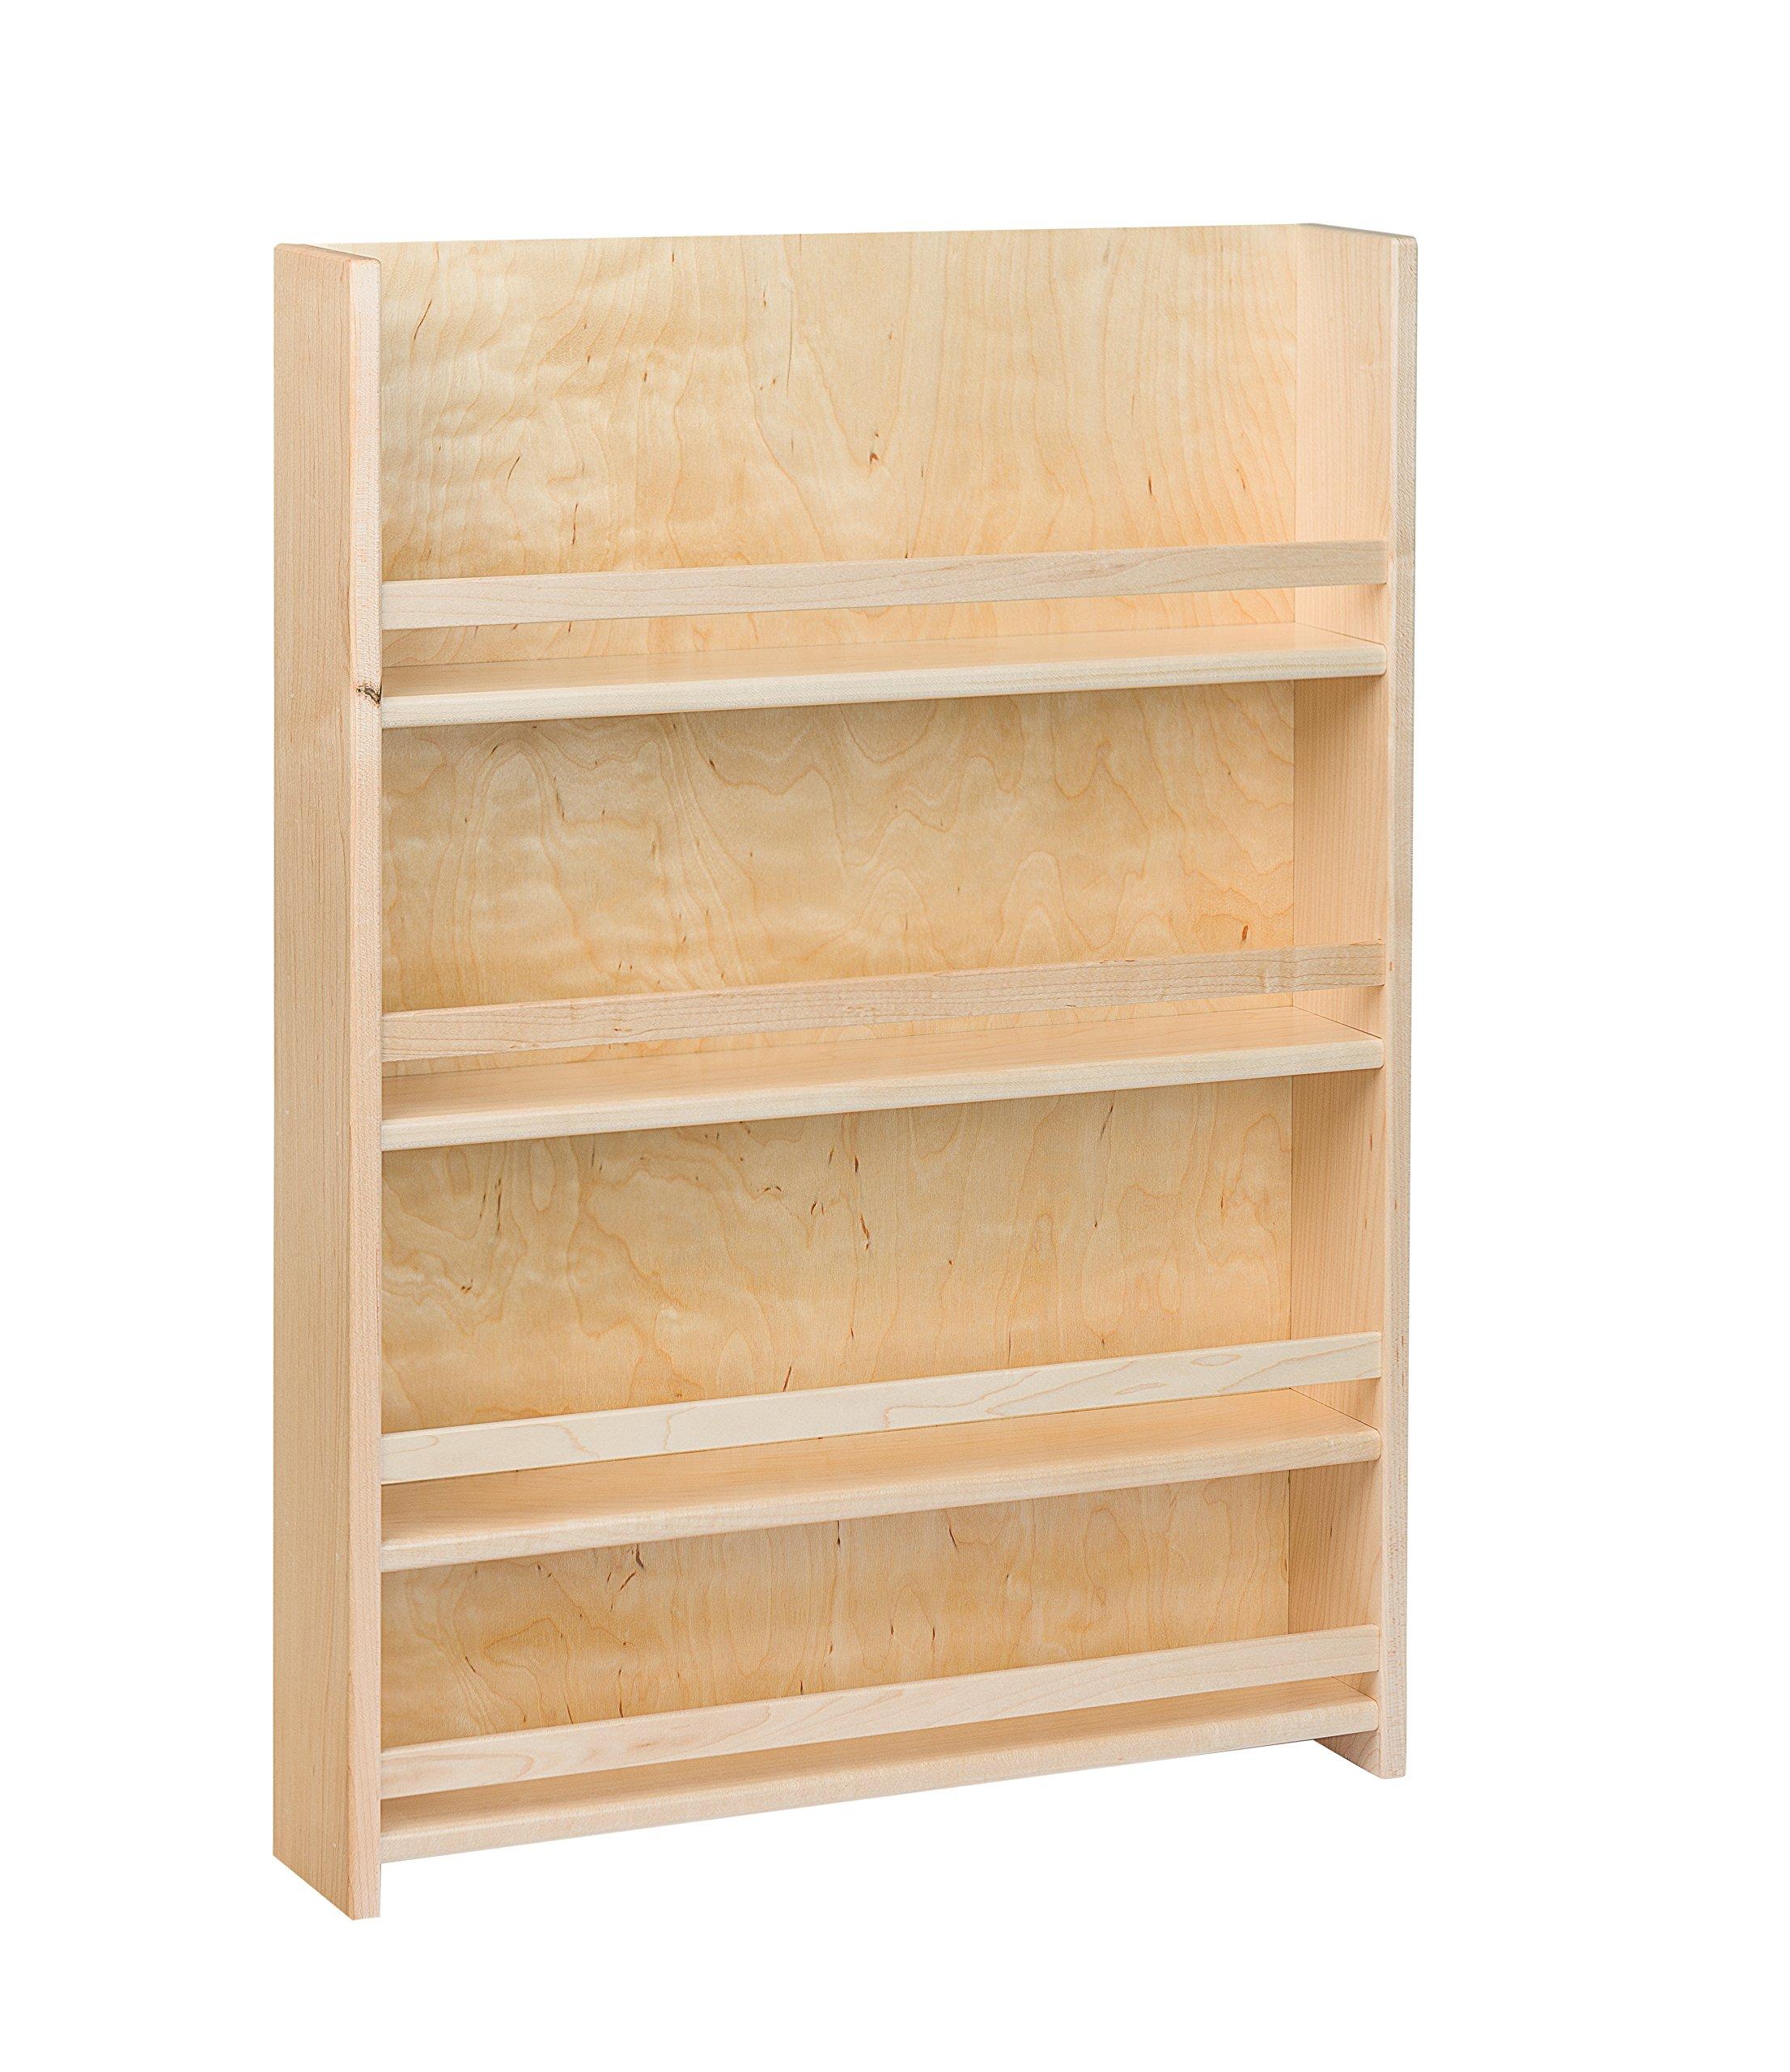 Century Components SRAS18PF Wood Door Mount Kitchen Spice Rack Organizer, 18'' by Century Components